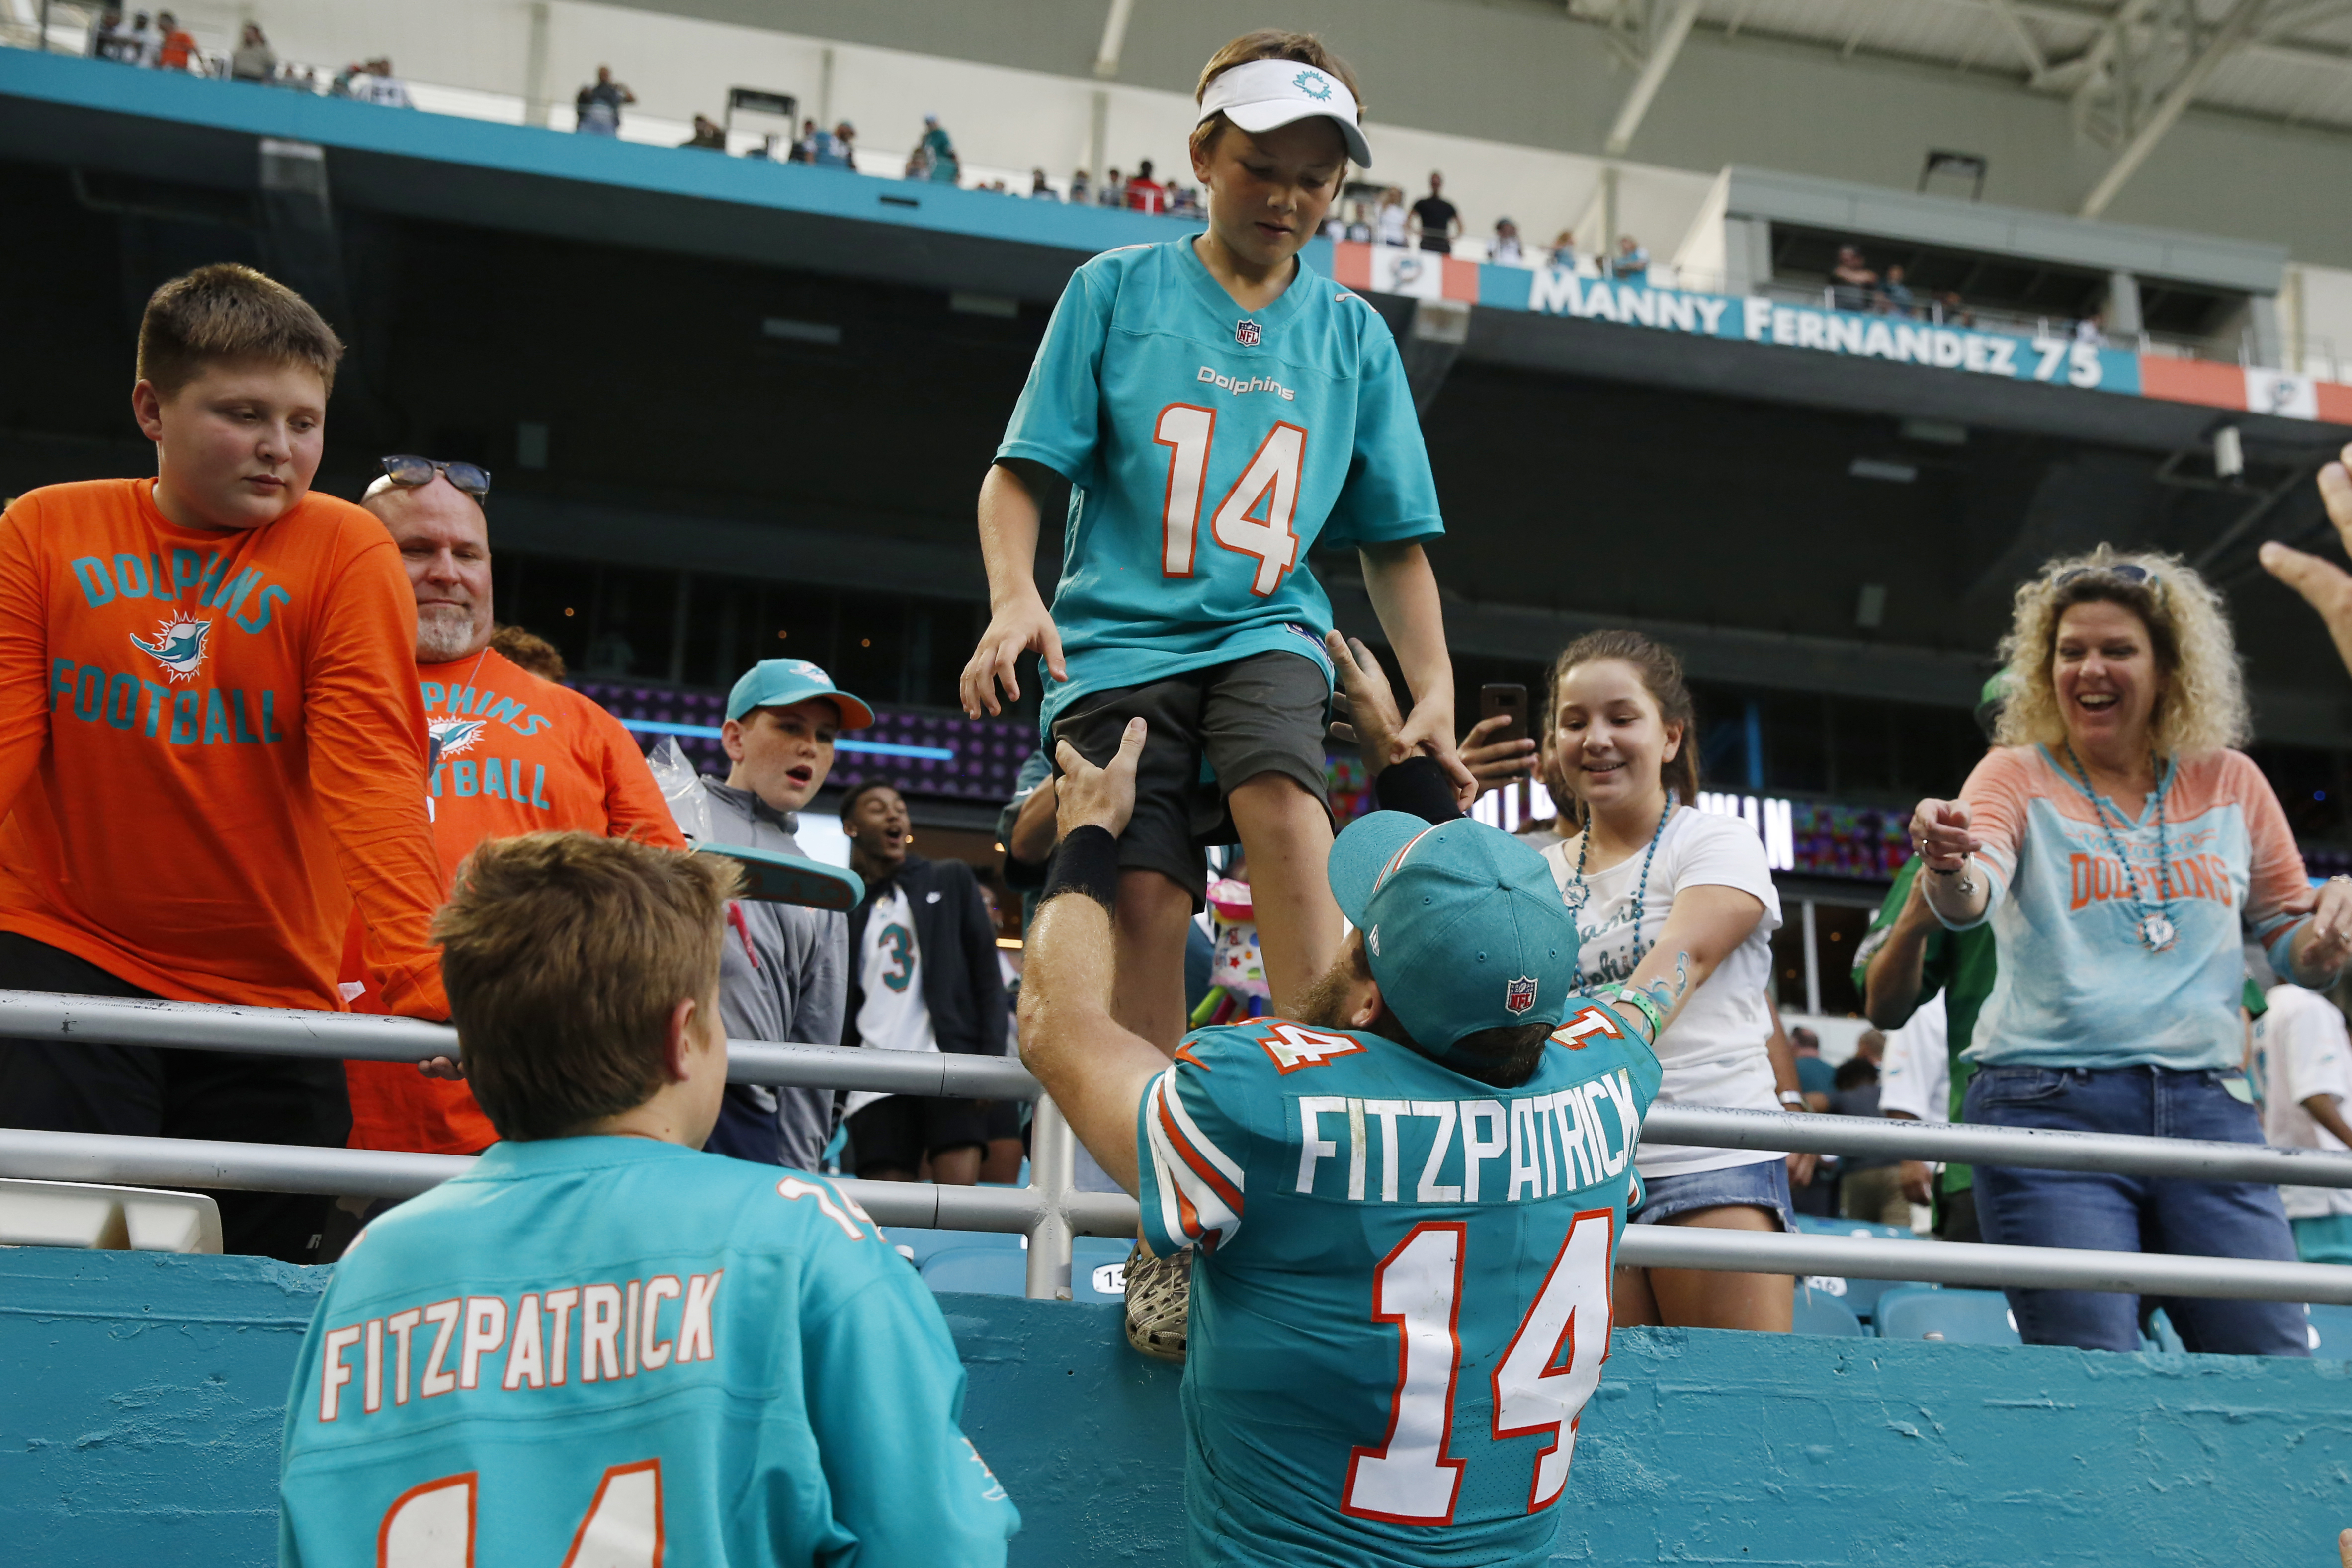 Fitzpatrick awaits battle with Tua for Dolphins' QB job